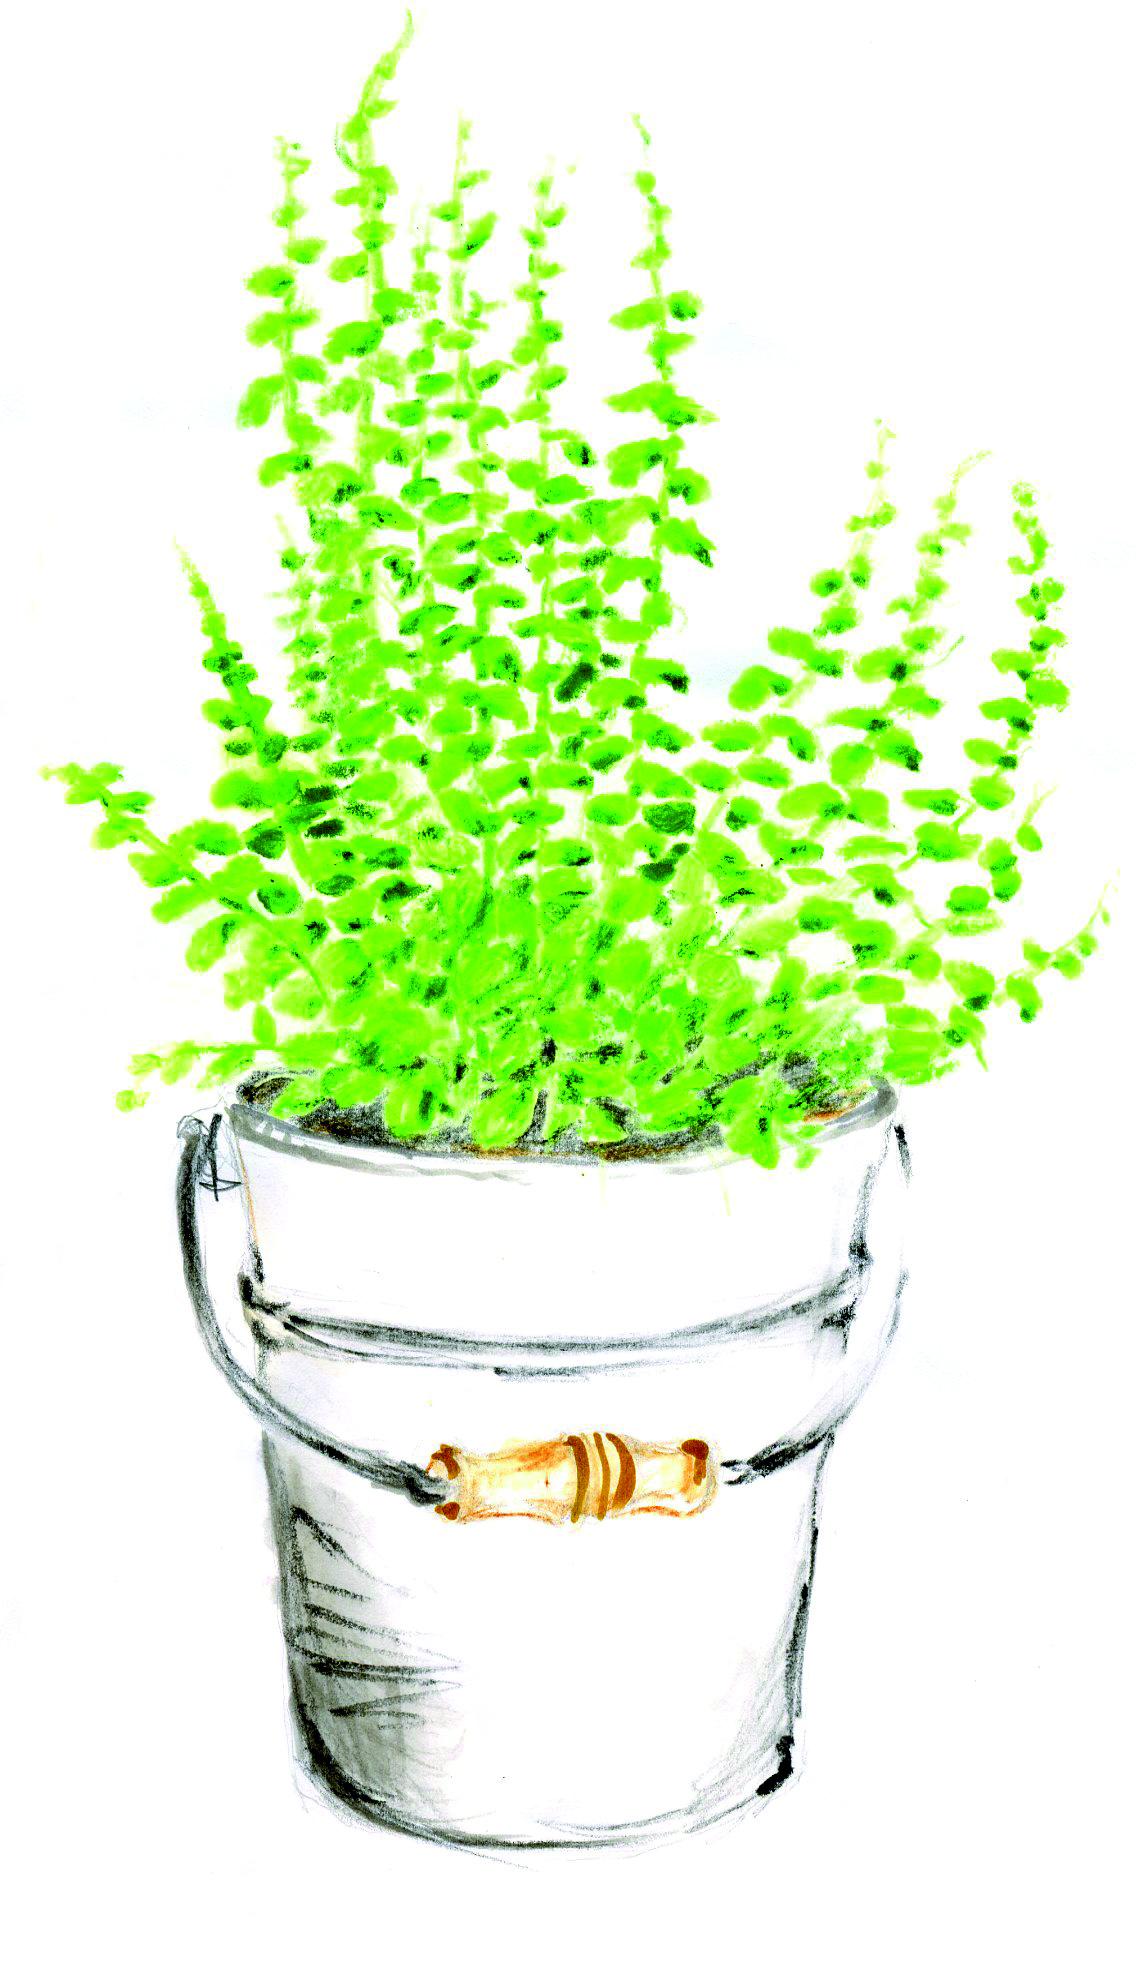 Menthe blog oleomac - Cultiver menthe en pot ...